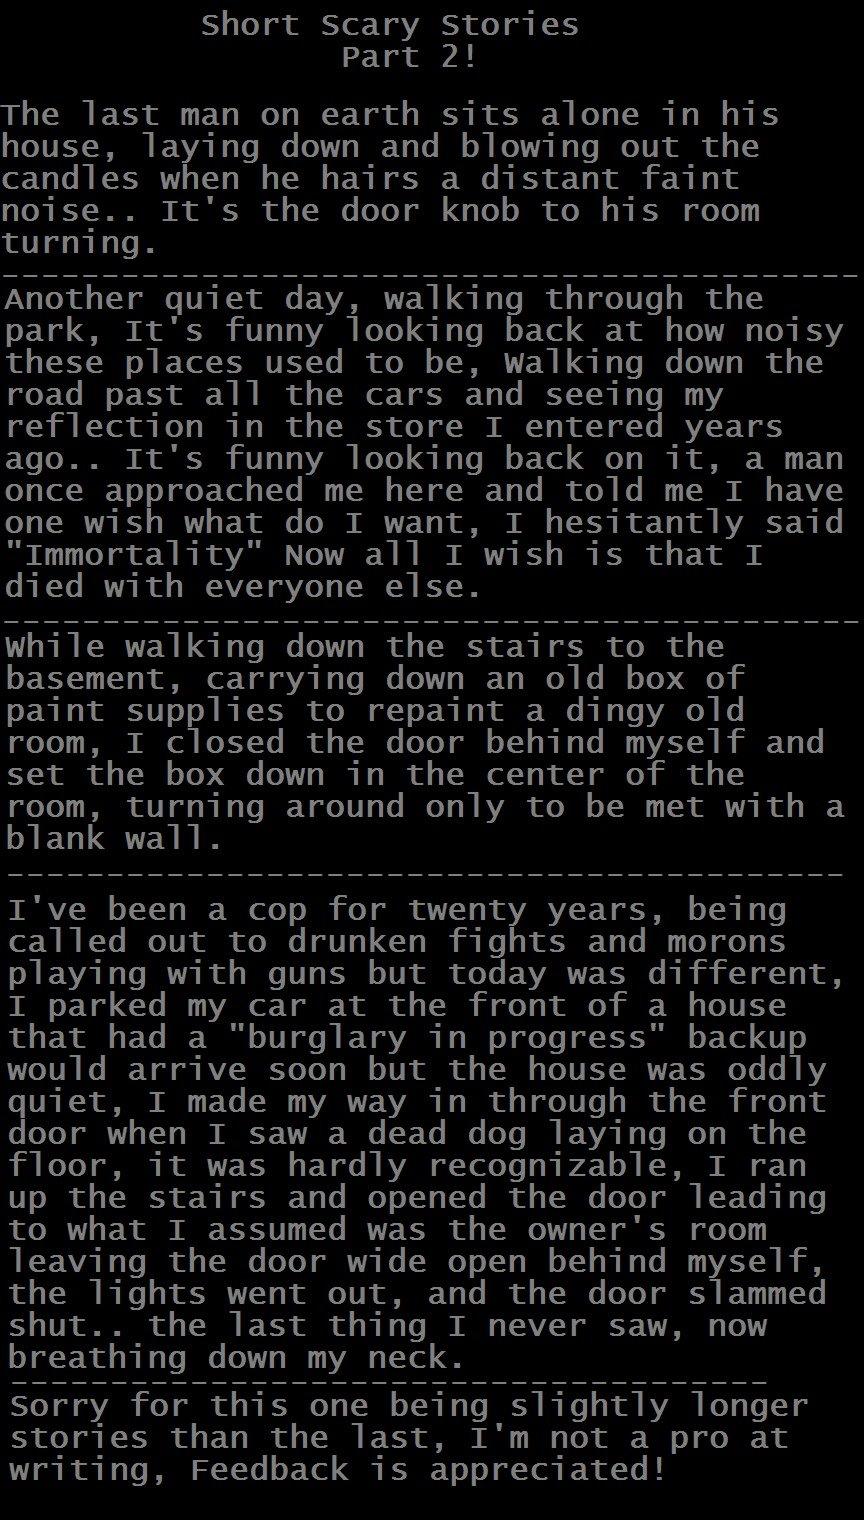 morbid short stories 2